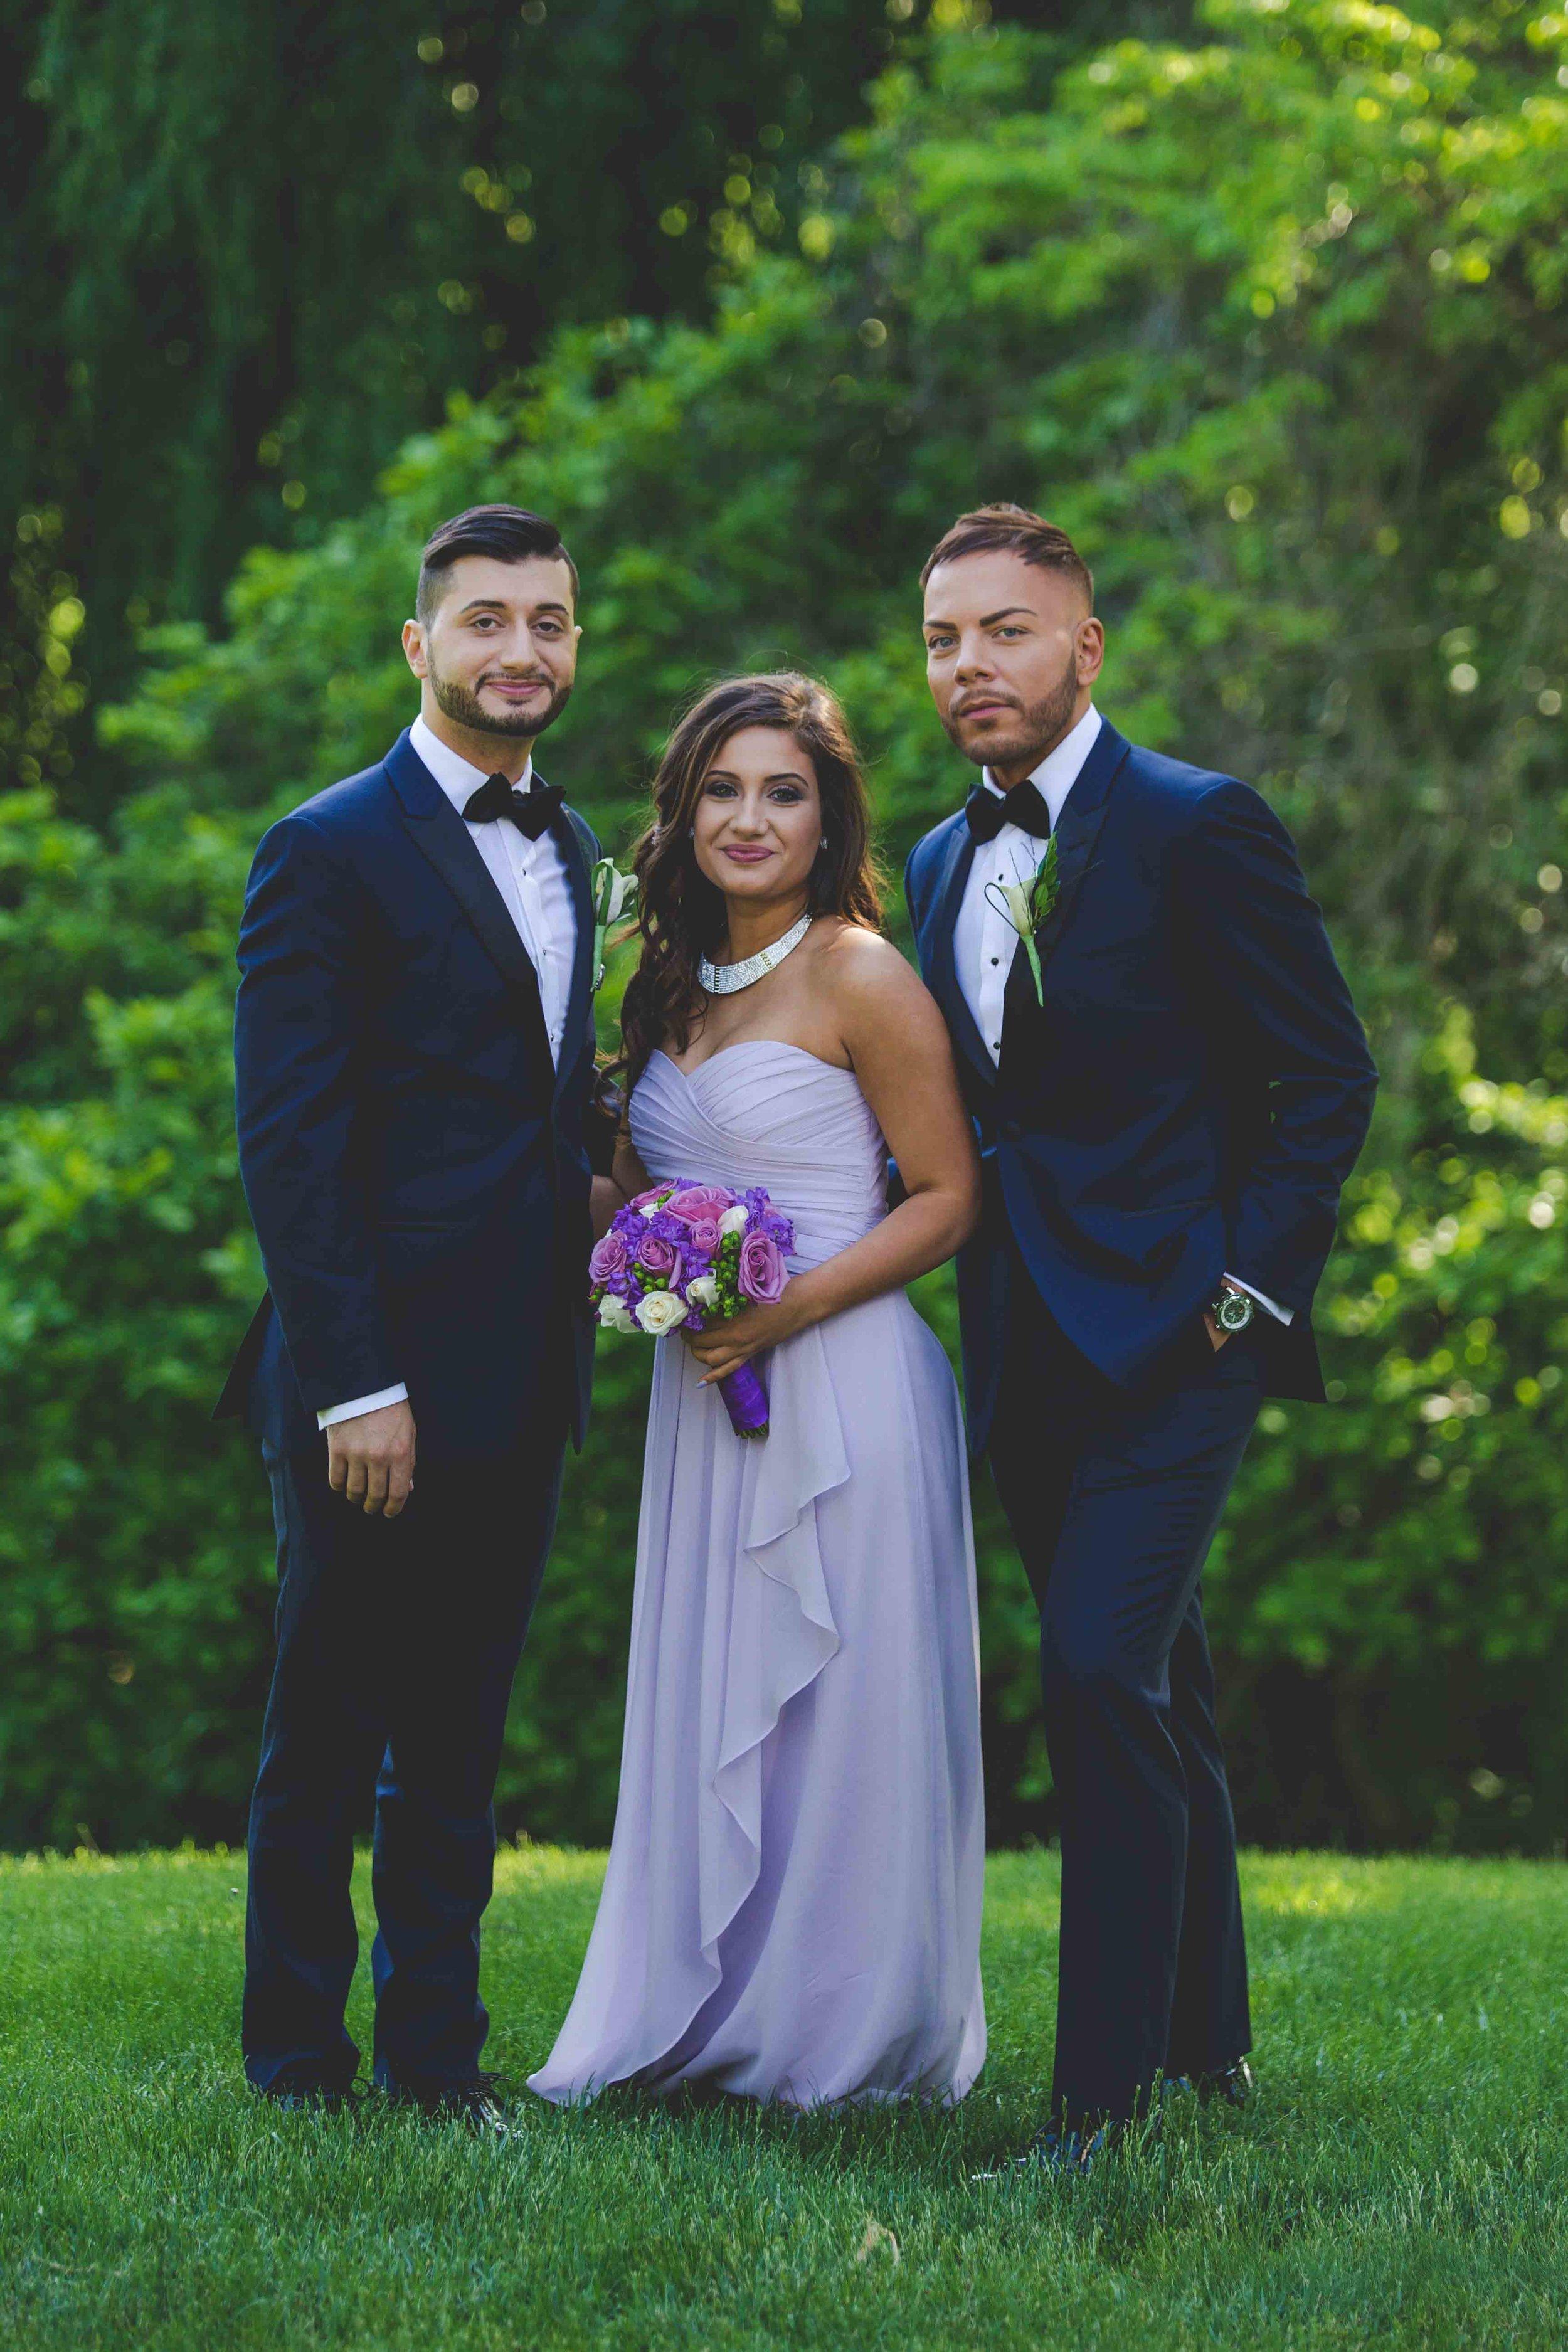 lyndhurst-mansion-amazing-gay-wedding-14.jpg